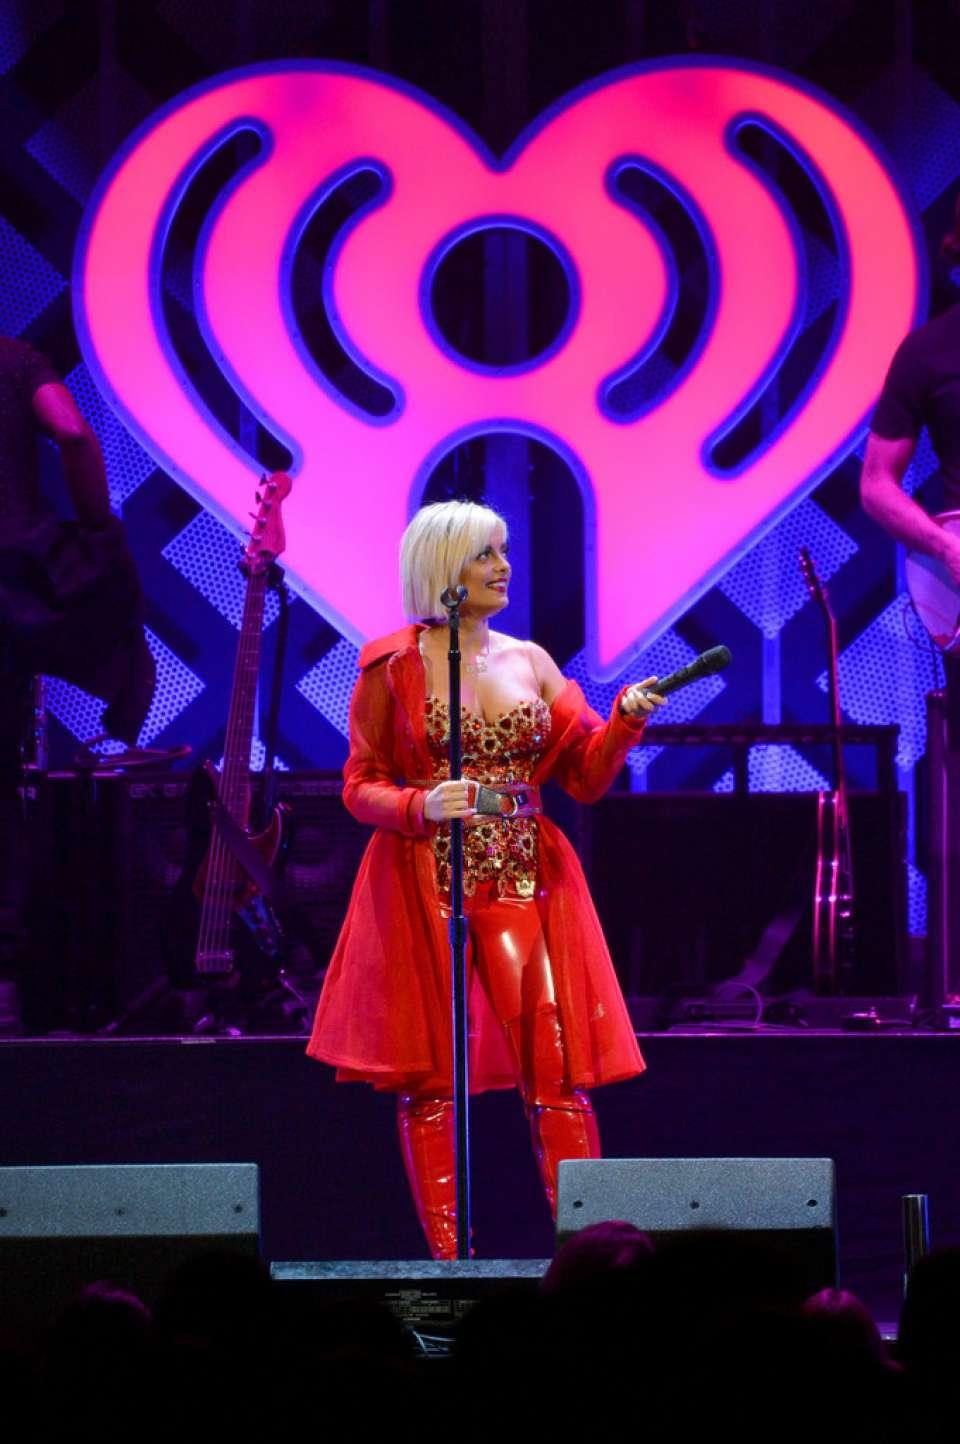 Bebe Rexha 2018 : Bebe Rexha: Performing at iHeart Radio Jingle Ball -08